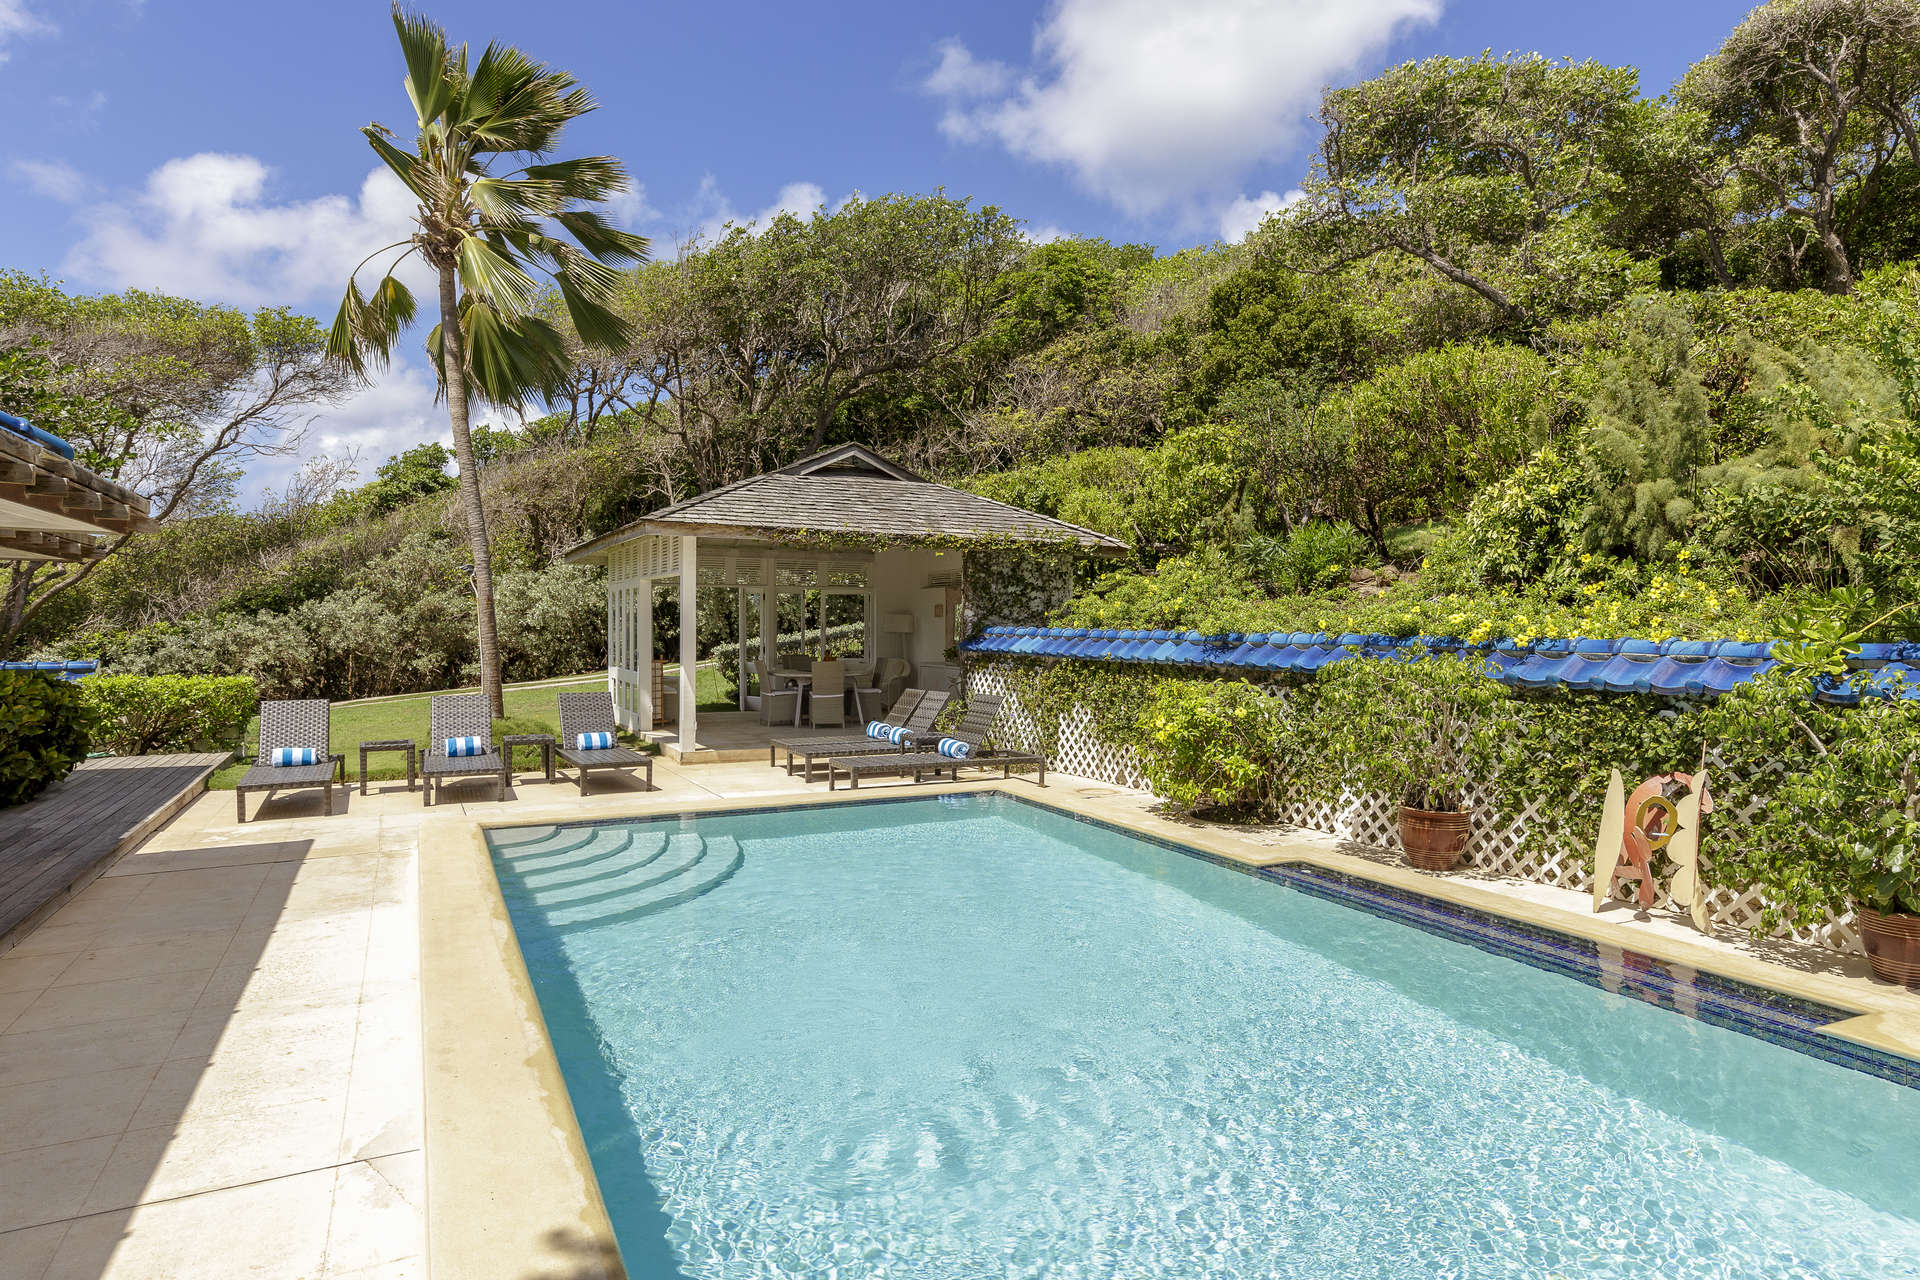 Luxury villa rentals caribbean - St vincent and the grenadines - St vincent - Mustique - Sapphire - Image 1/14